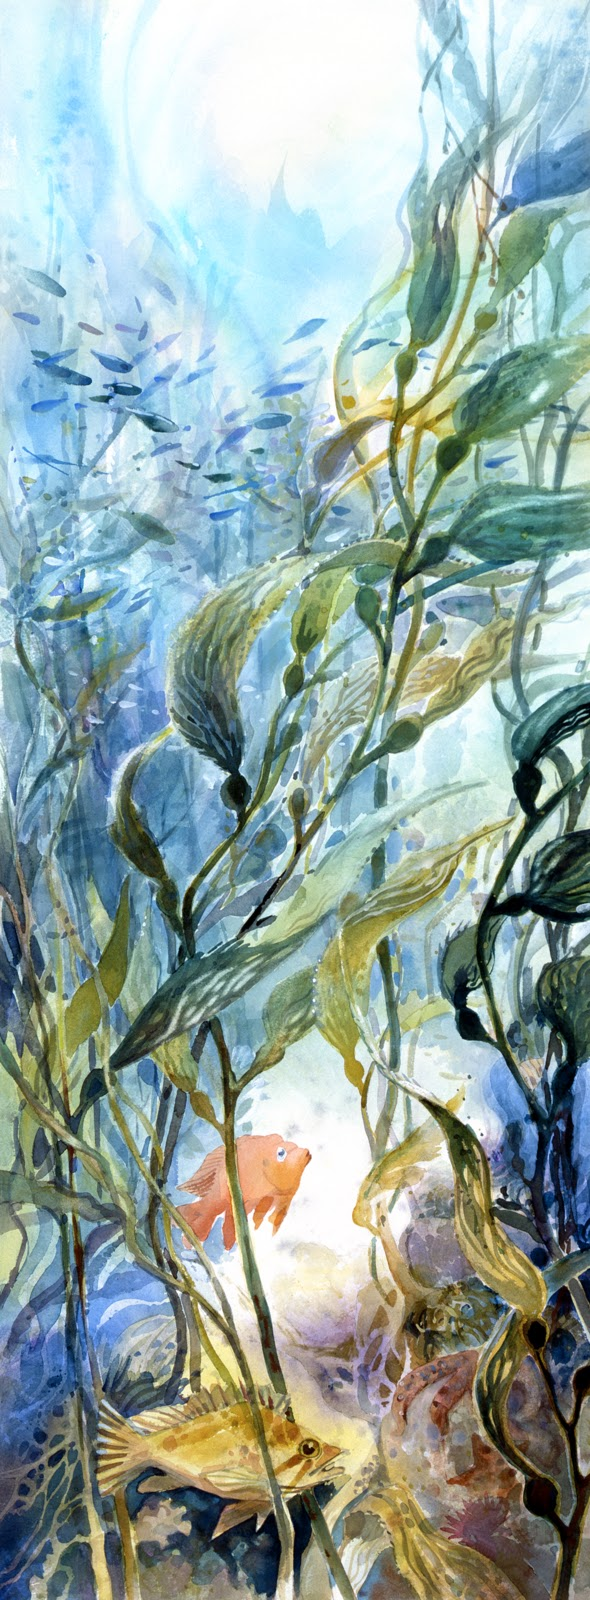 California kelp garden watercolor painting Margy Gates